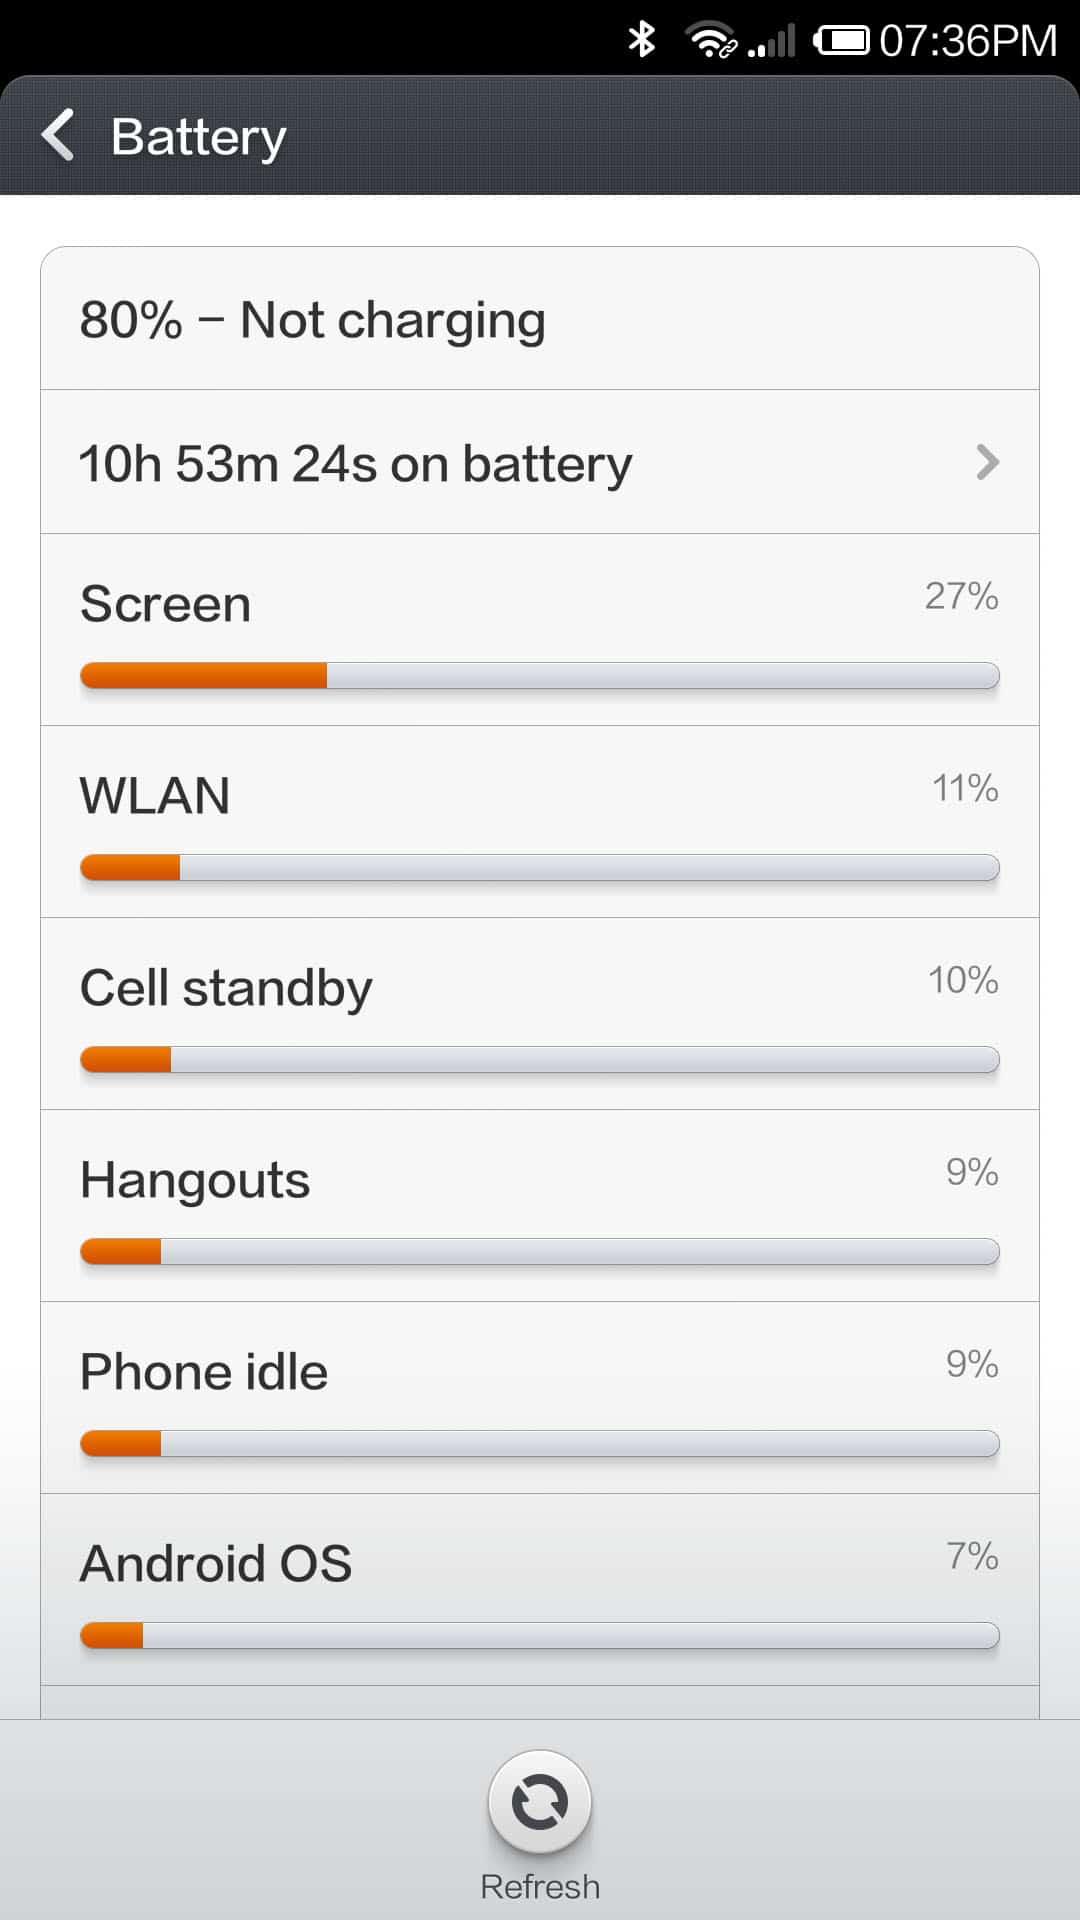 xiaomi mi4 miui5 battery standby